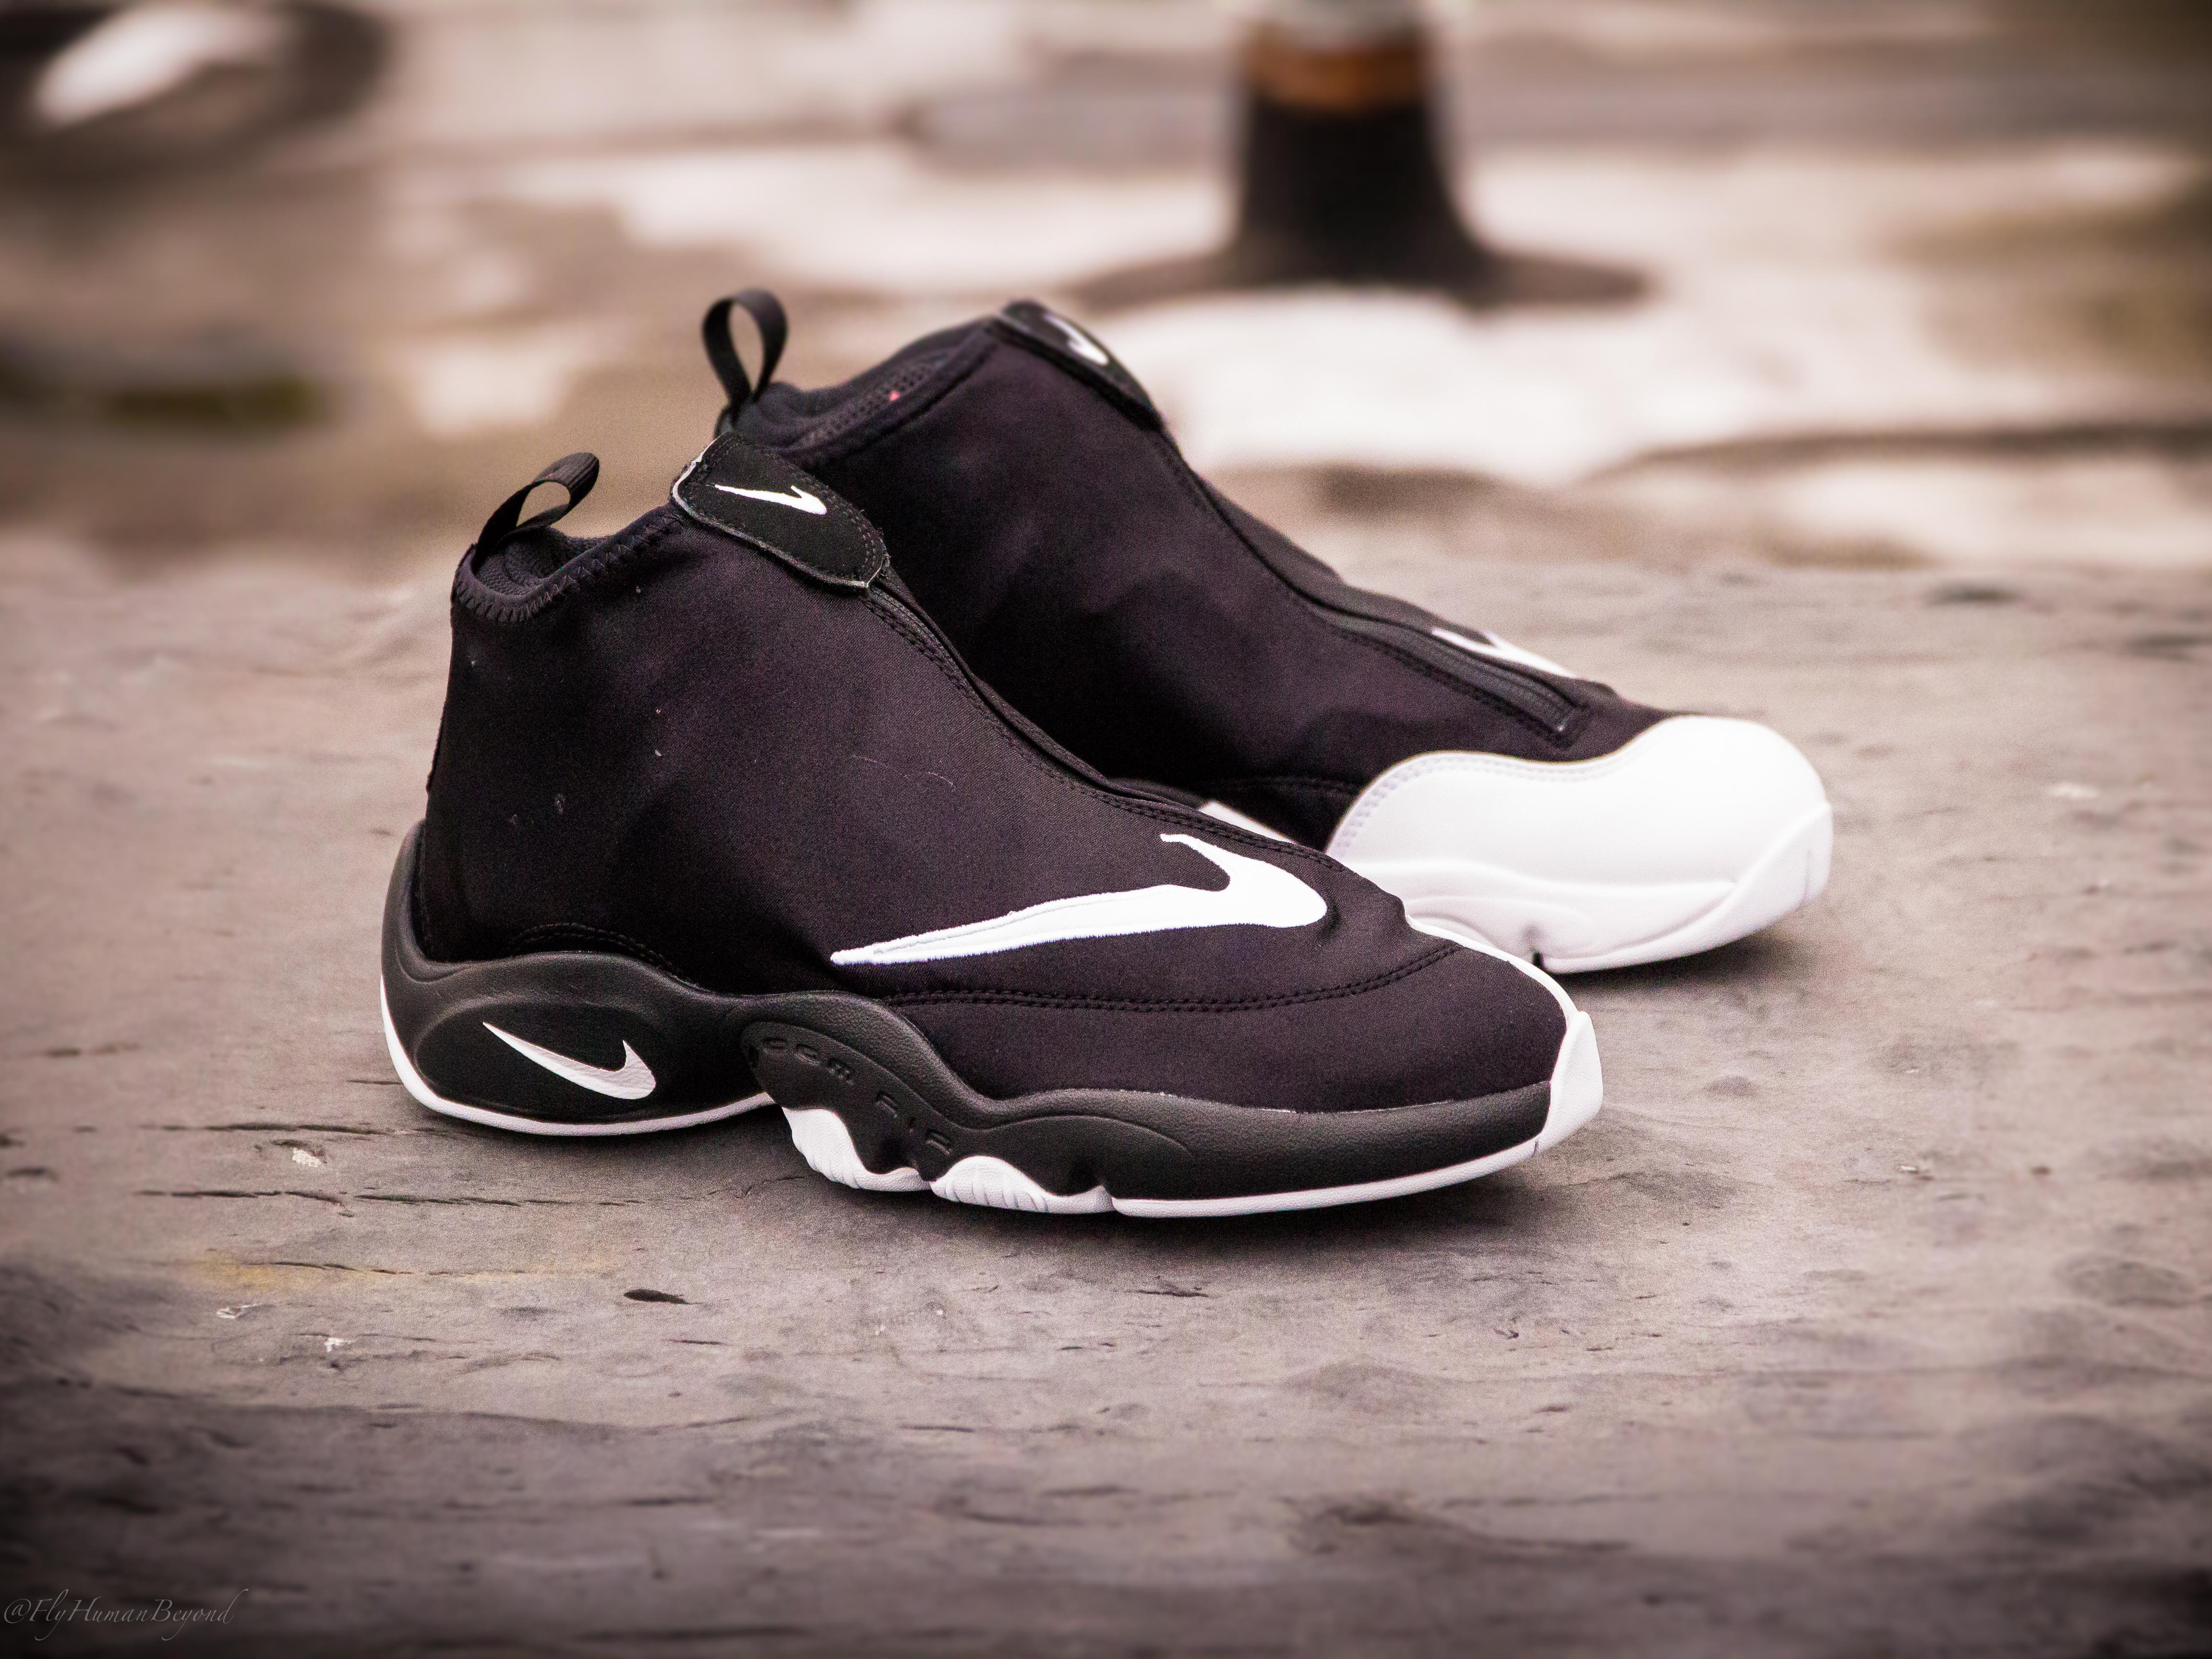 Nike Glove Basketball Shoes